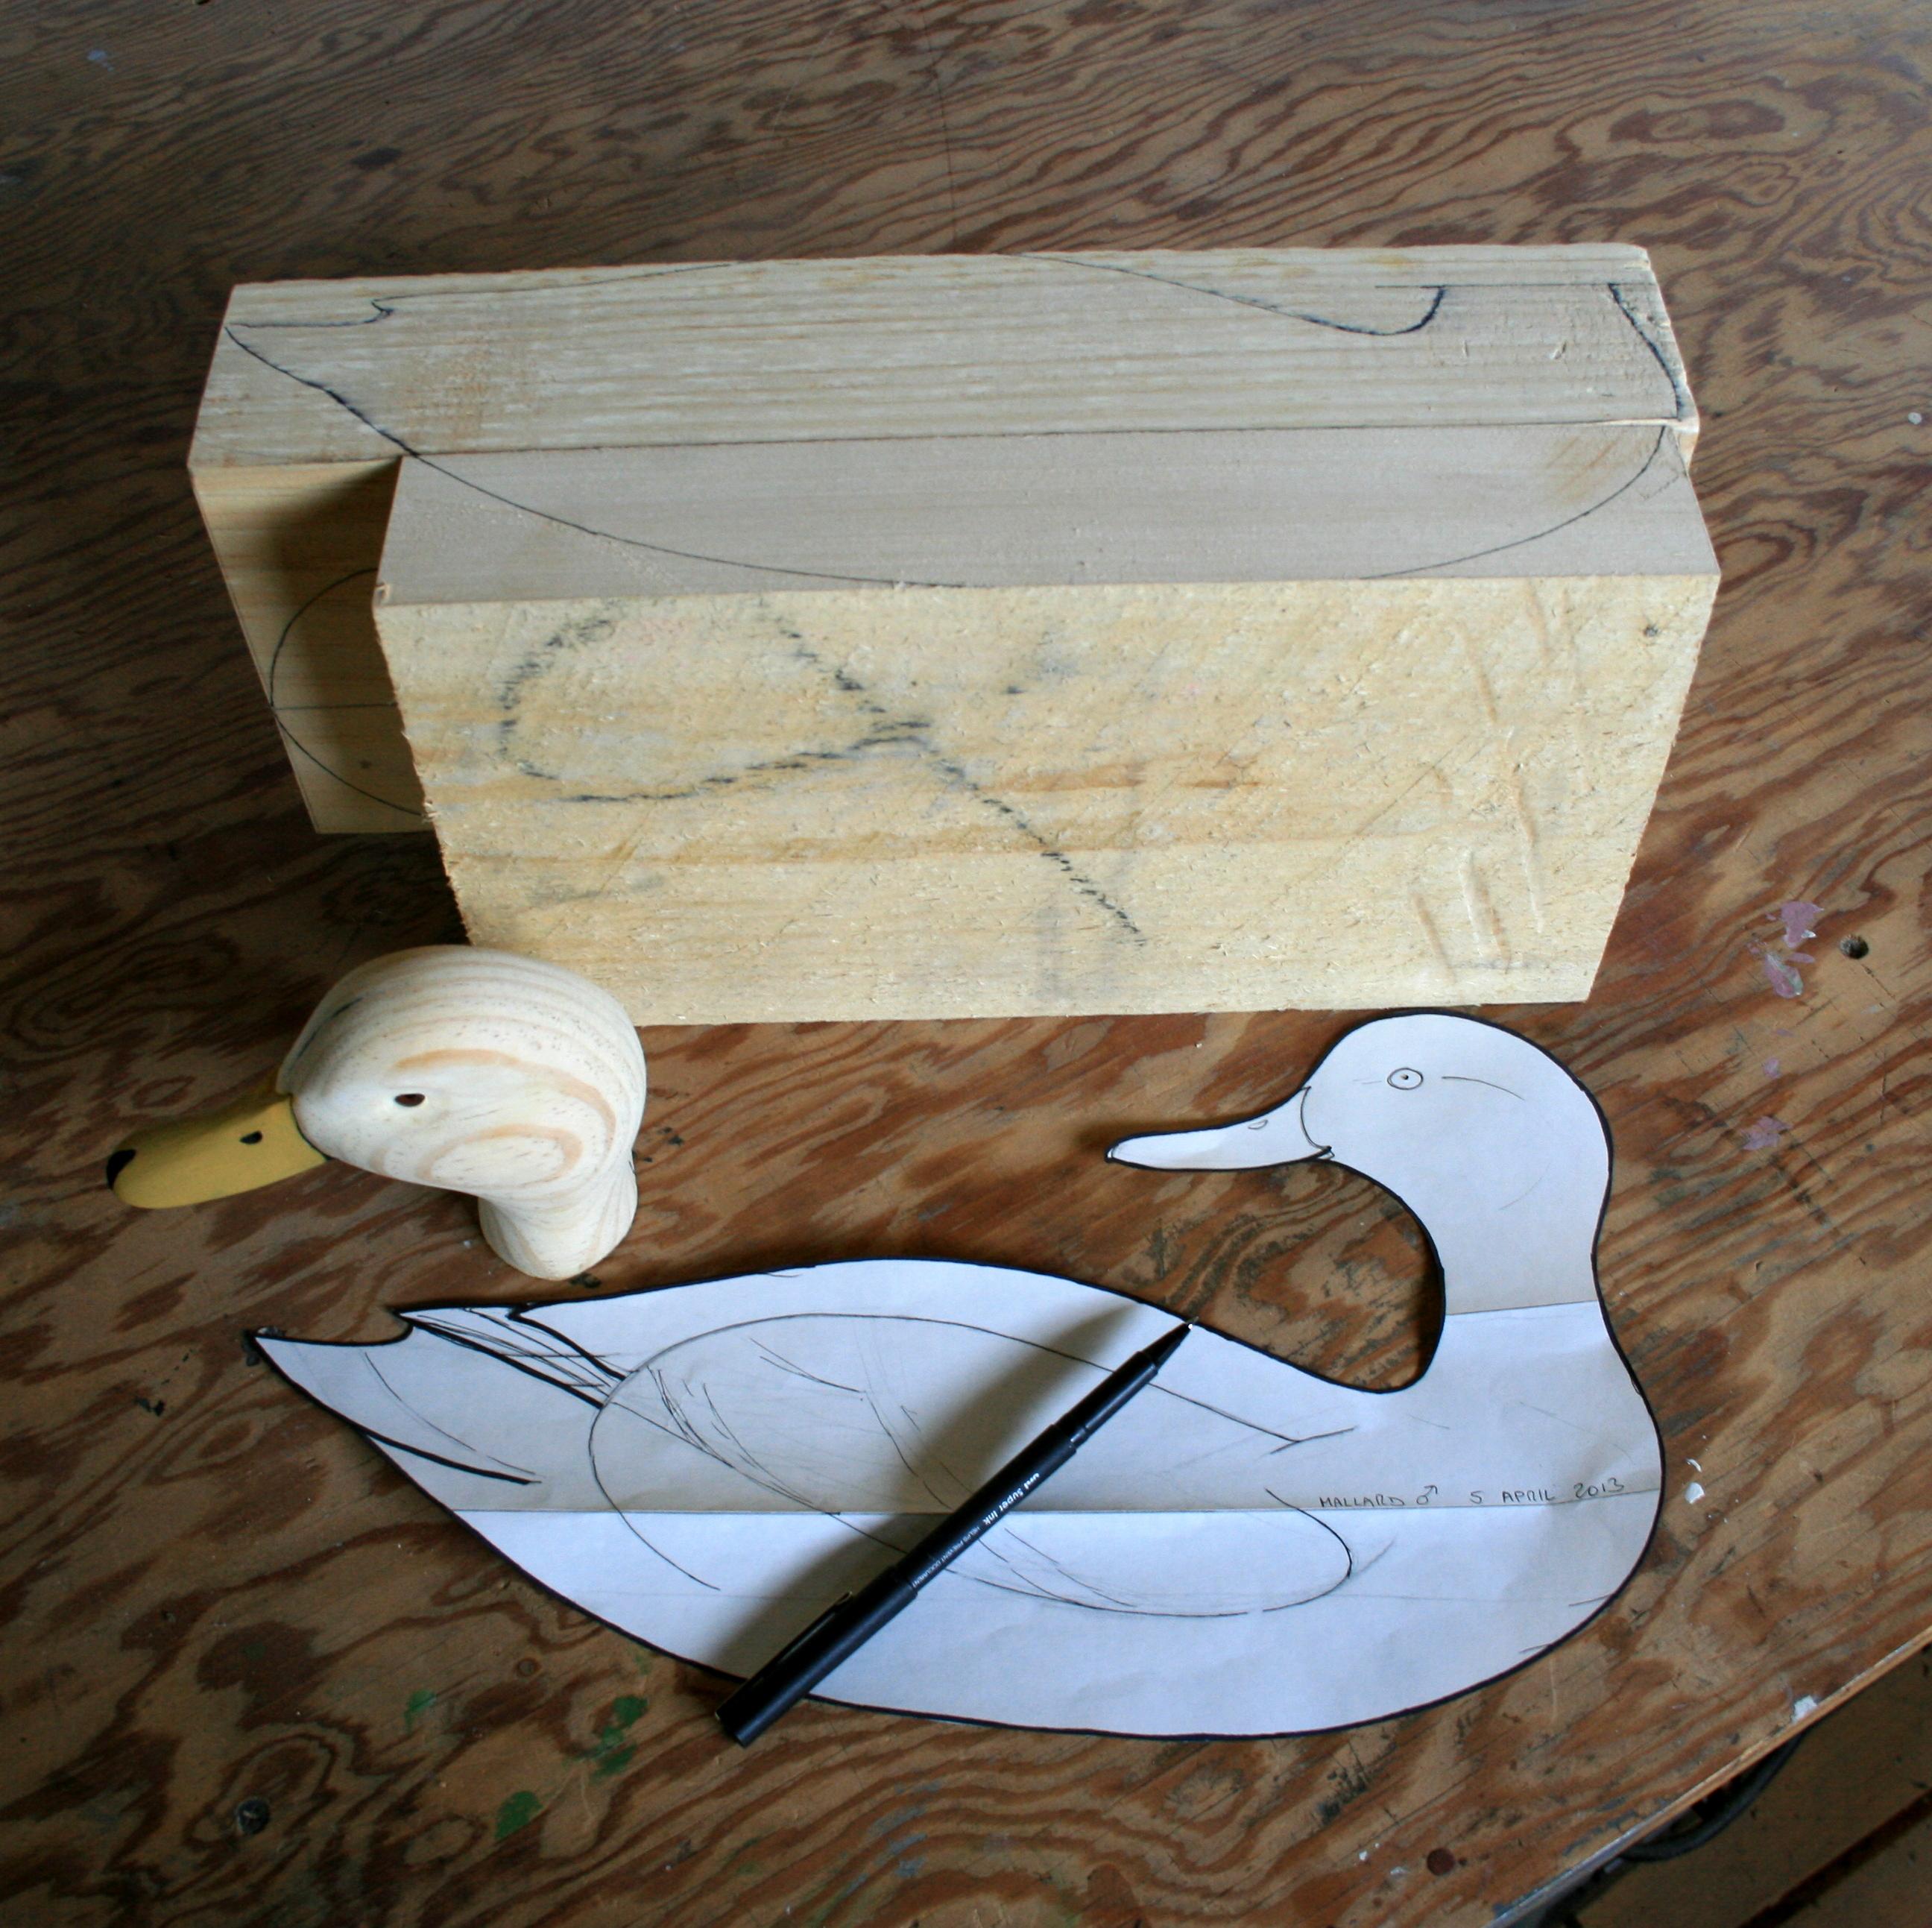 Carving a mallard body tutorial steven jay sanford